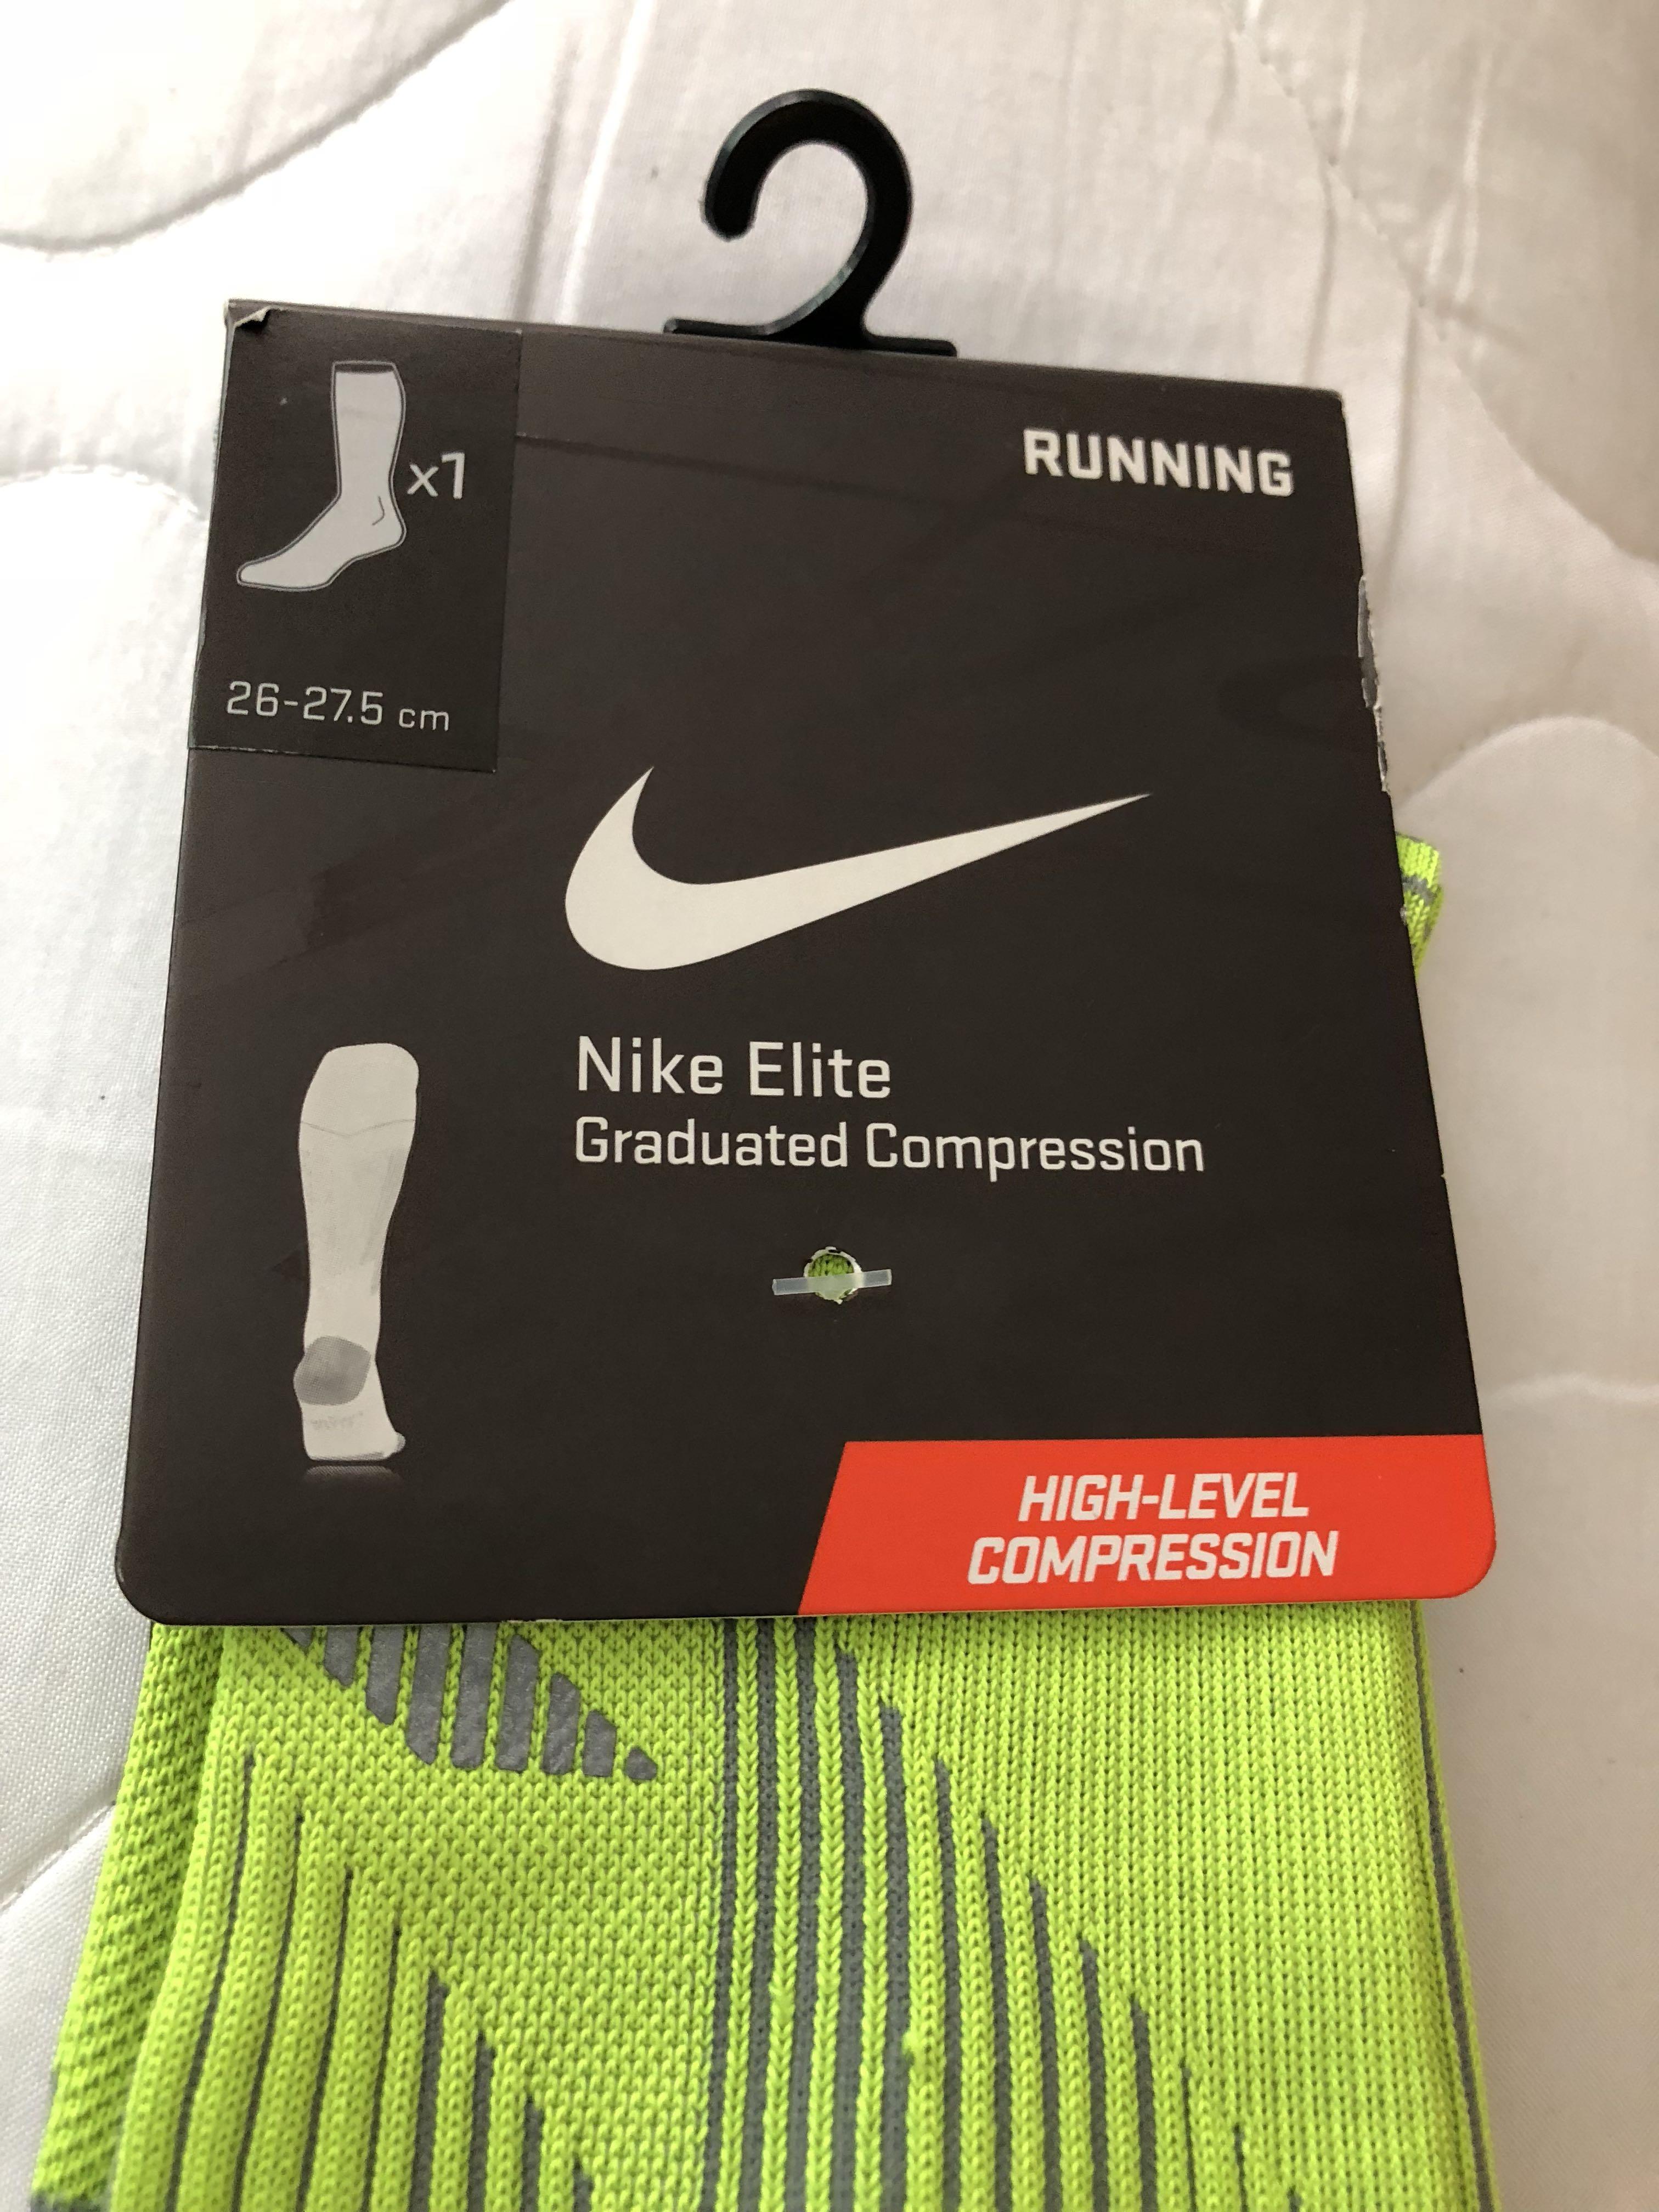 3e8ef1cbf3 Nike Compression socks Size 3, Sports, Sports Apparel on Carousell